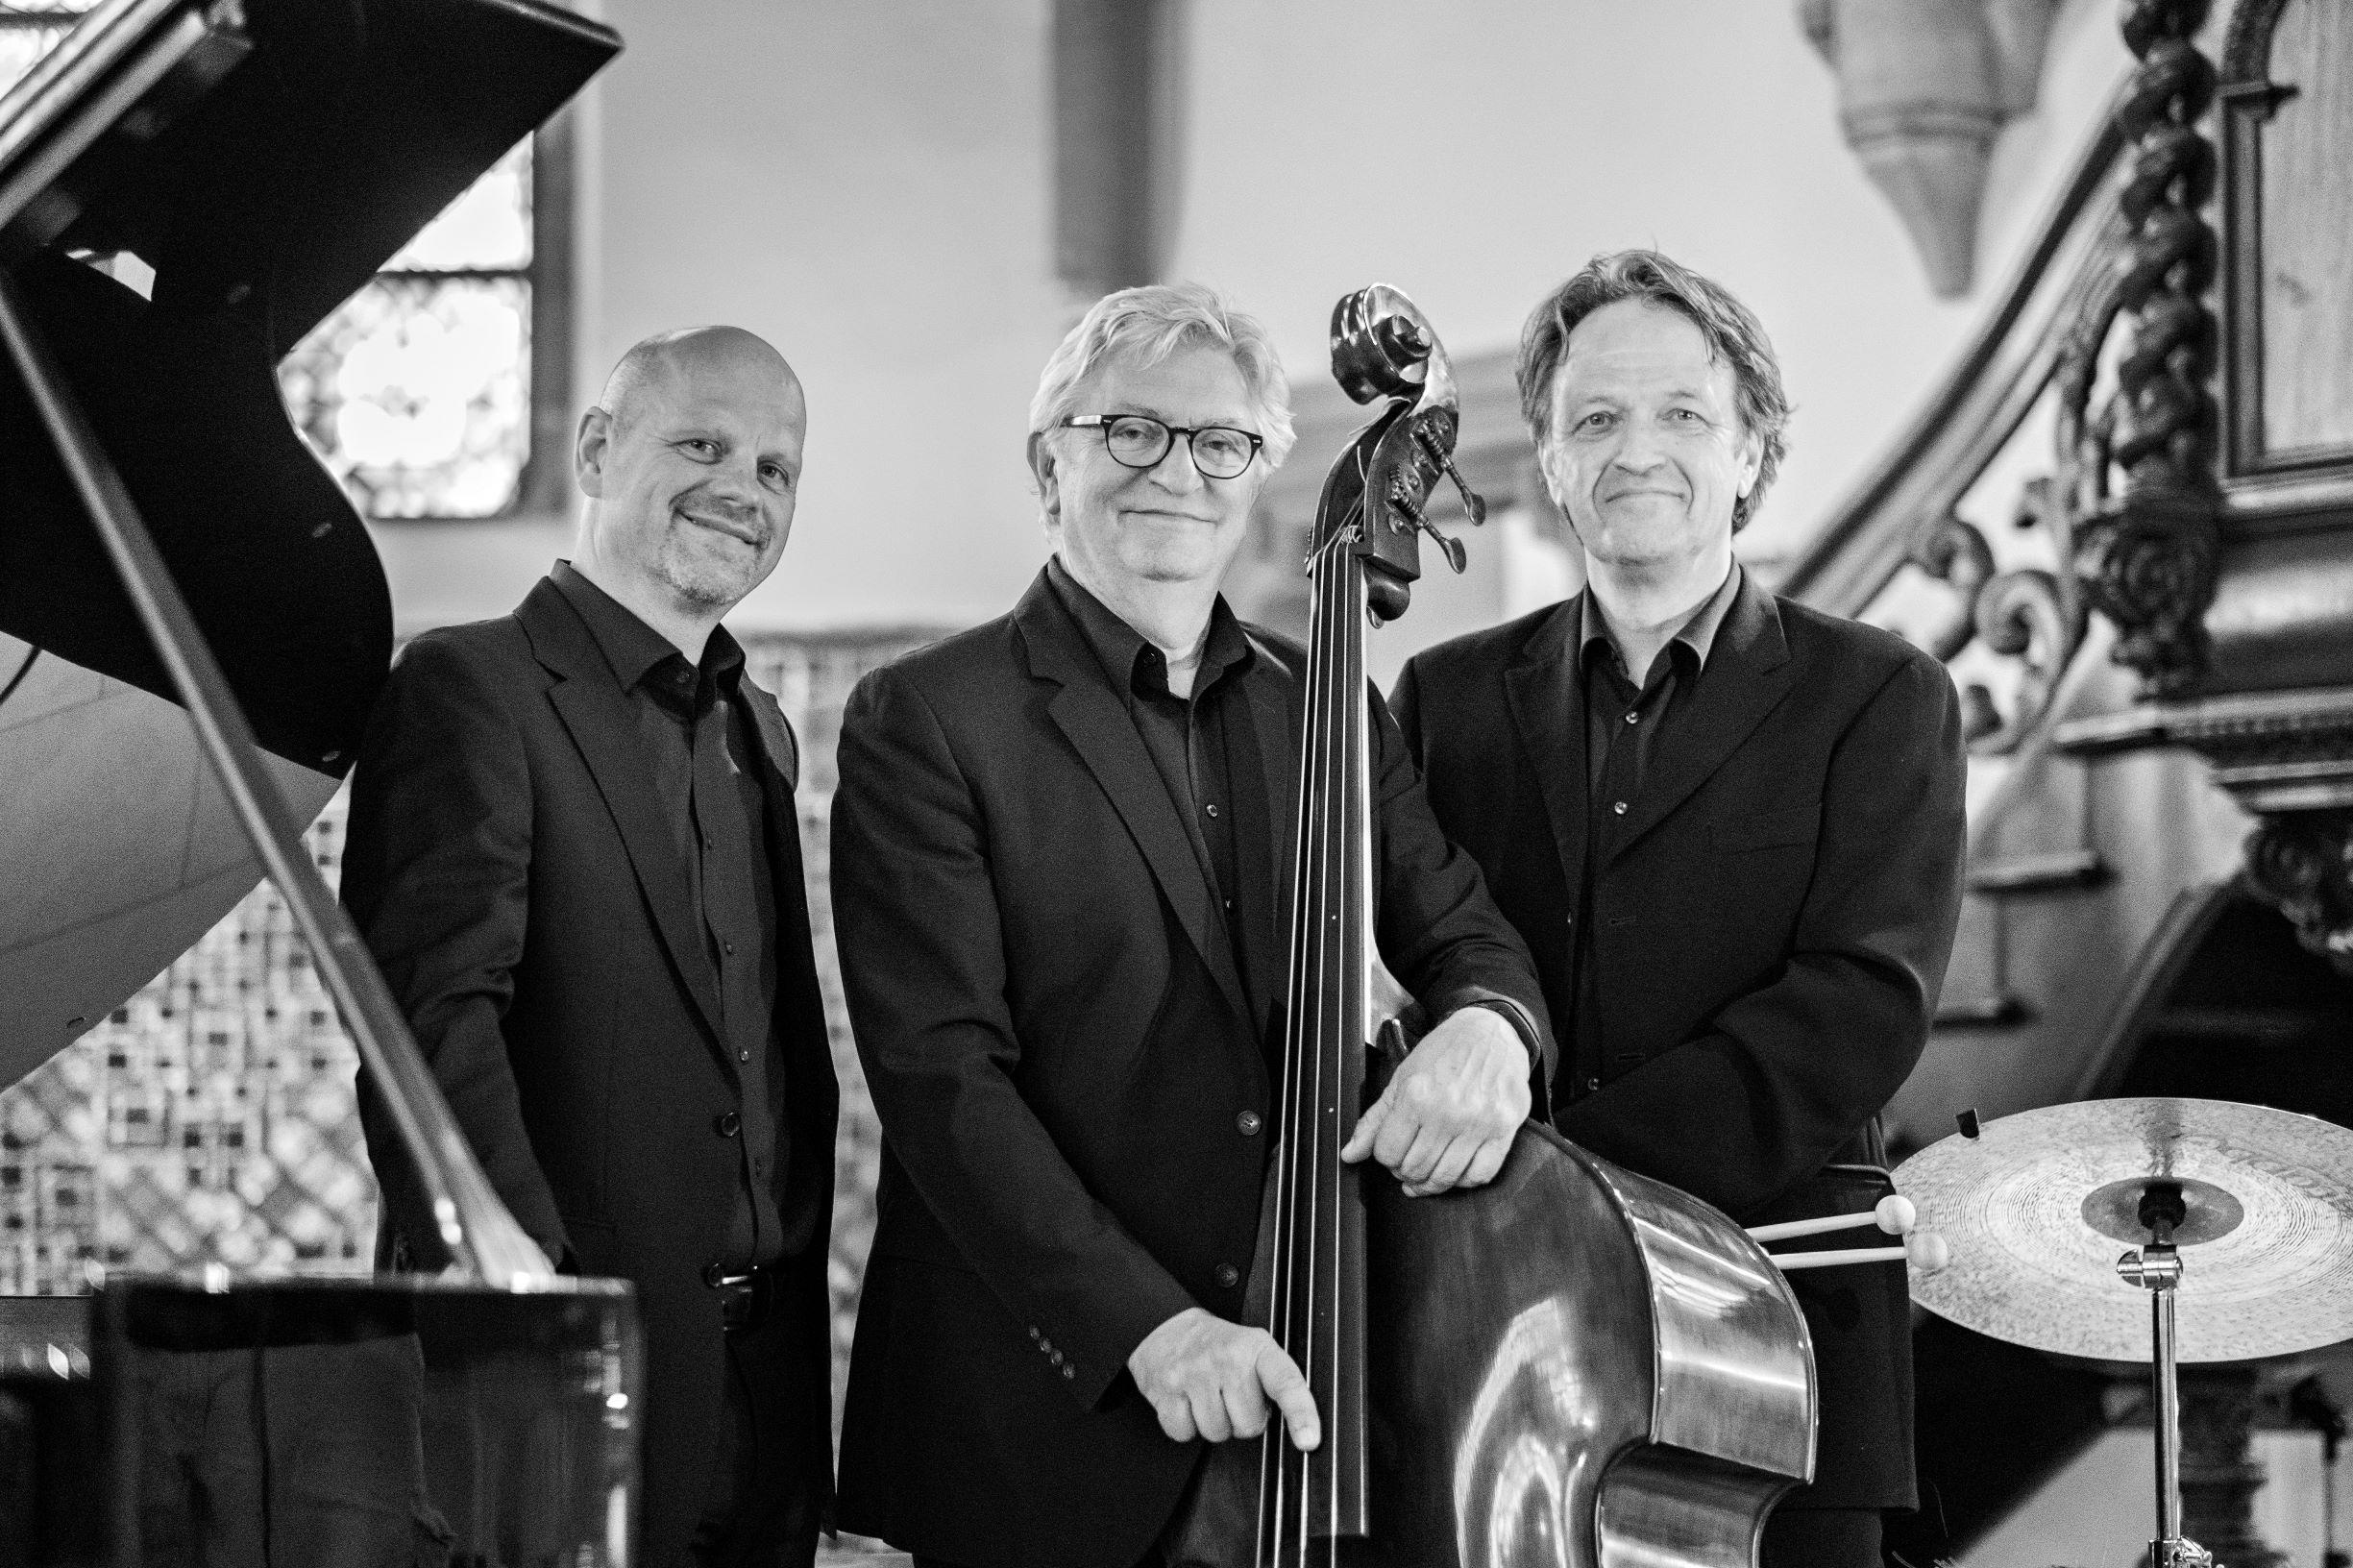 Jazztrio Kordes-Tetzlaff-Godejohann @ KTG Trio